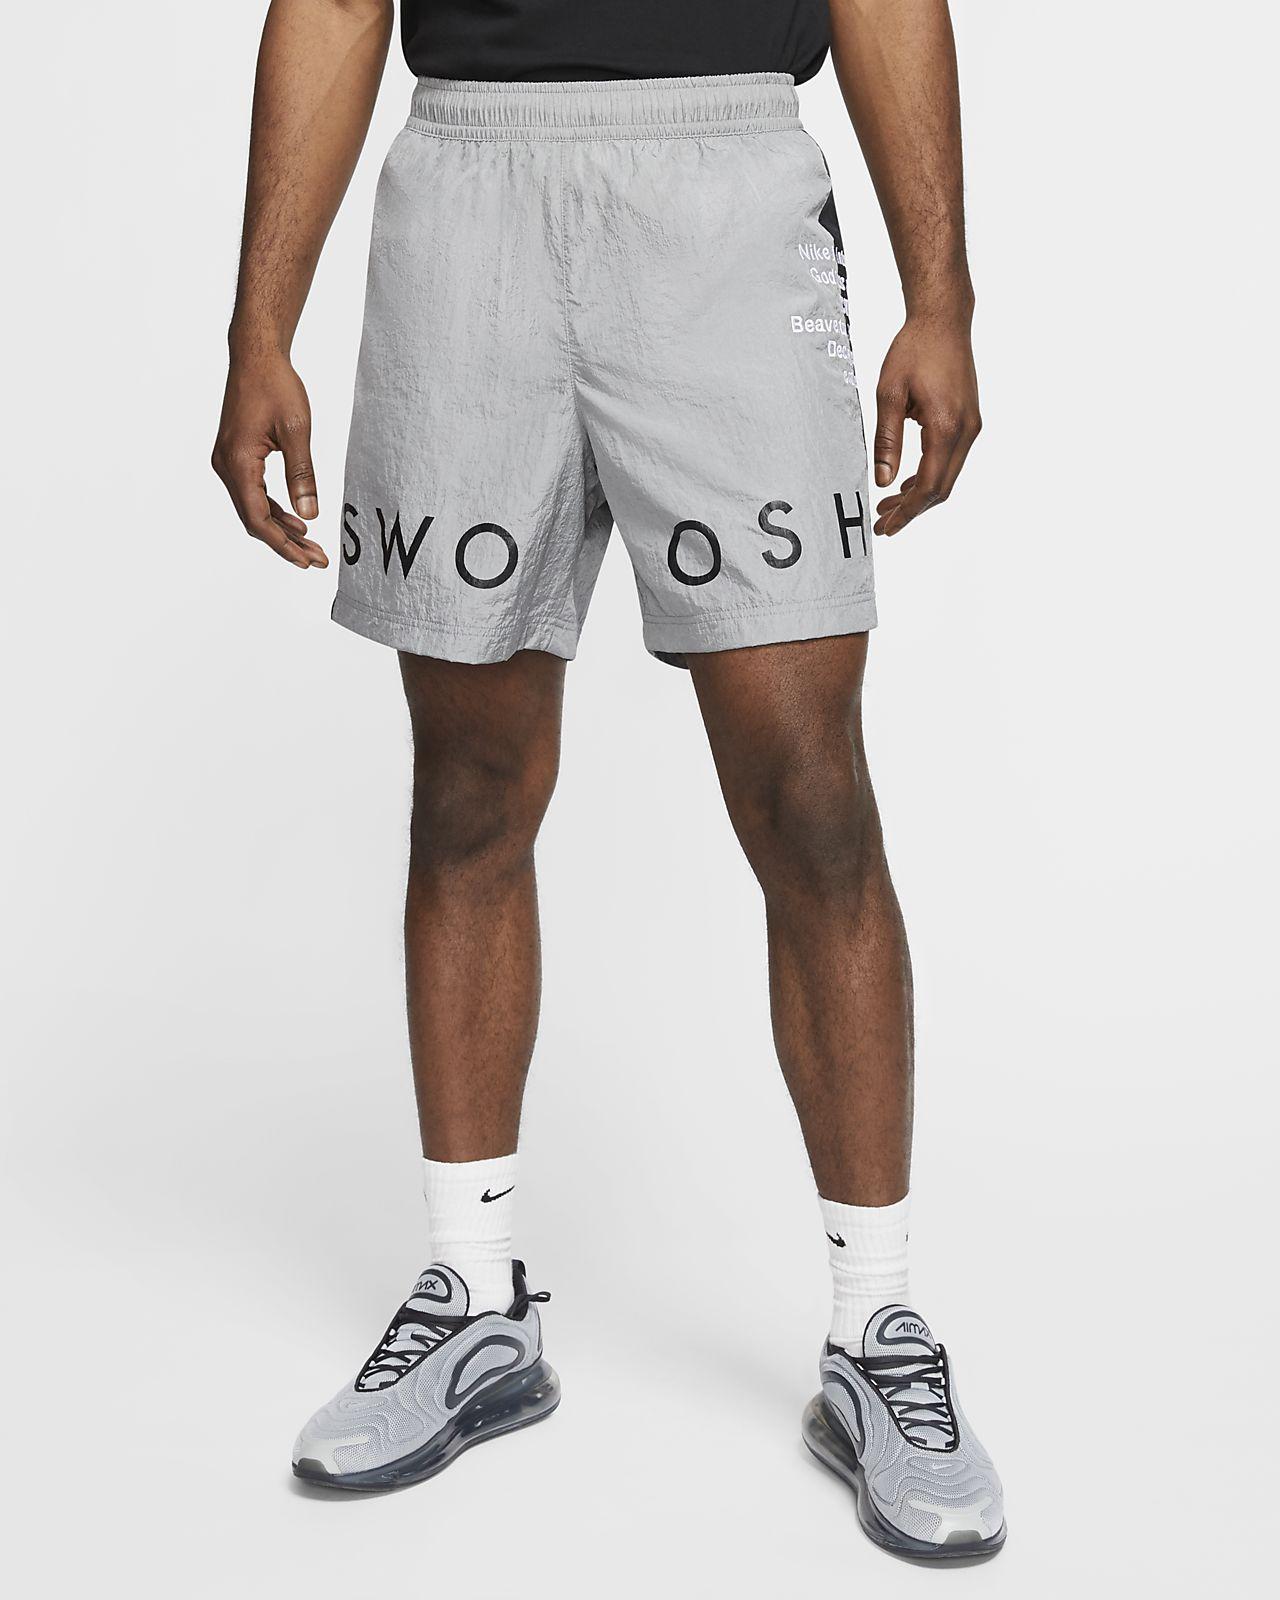 Short tissé Nike Sportswear Swoosh pour Homme